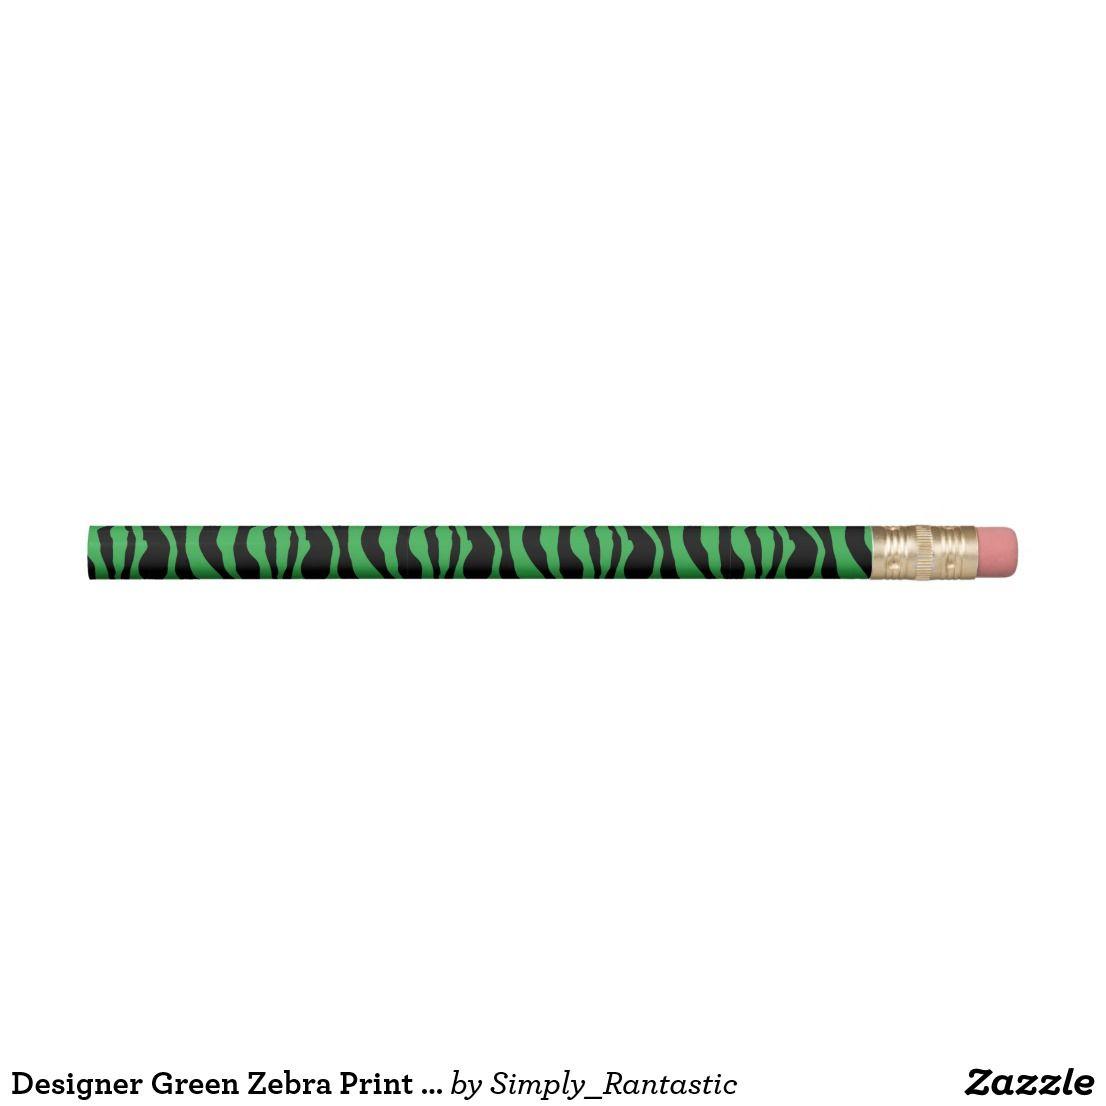 Designer Green Zebra Print Pencils